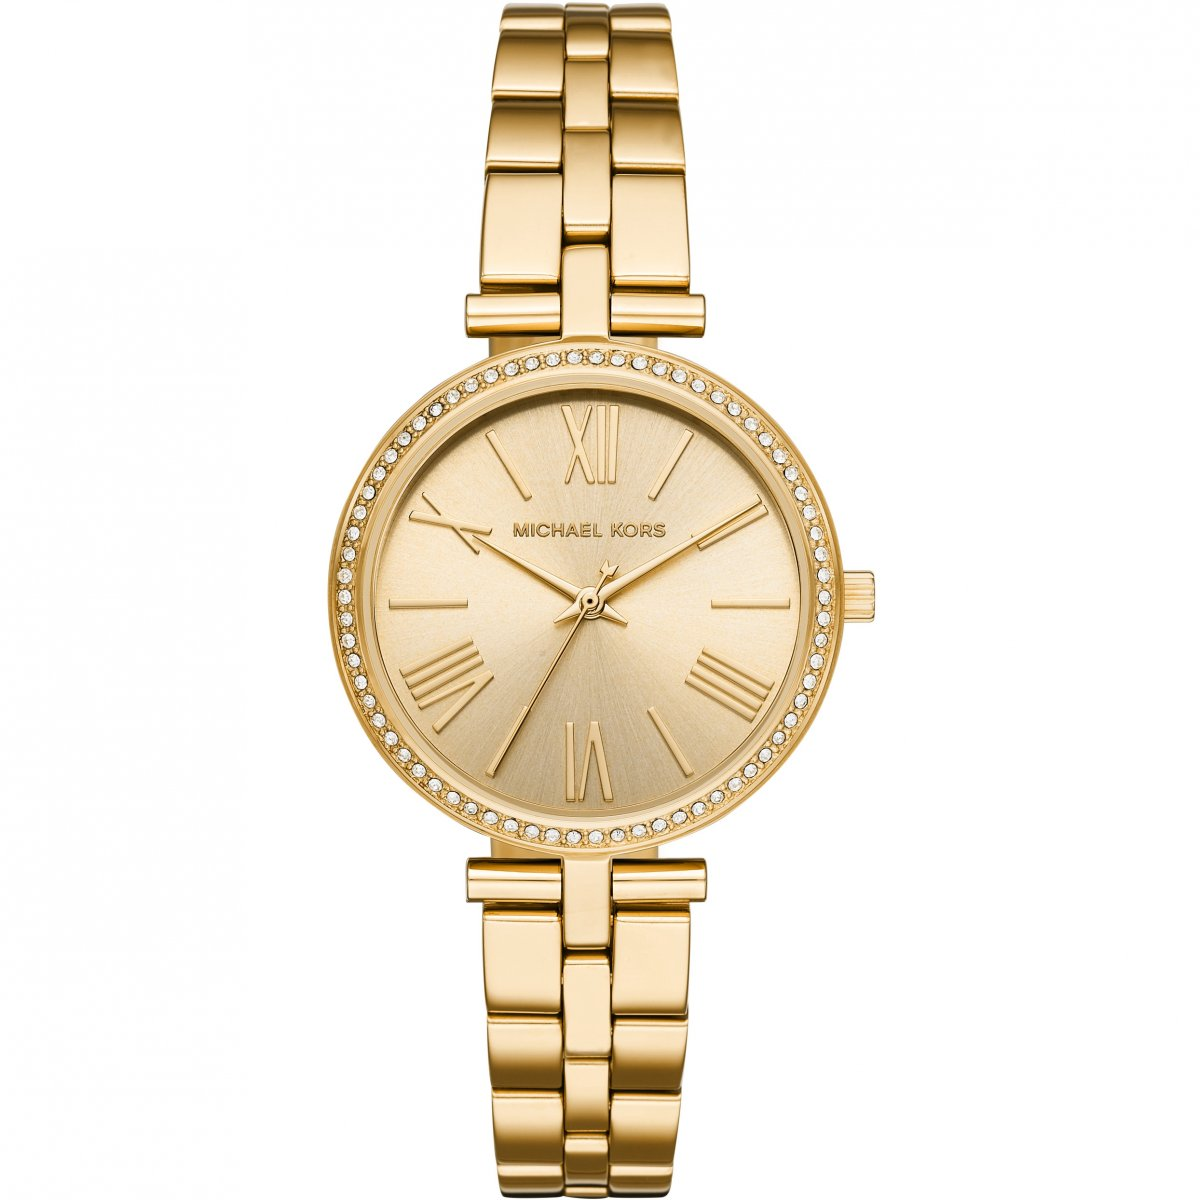 Zlaté hodinky MICHAEL KORS